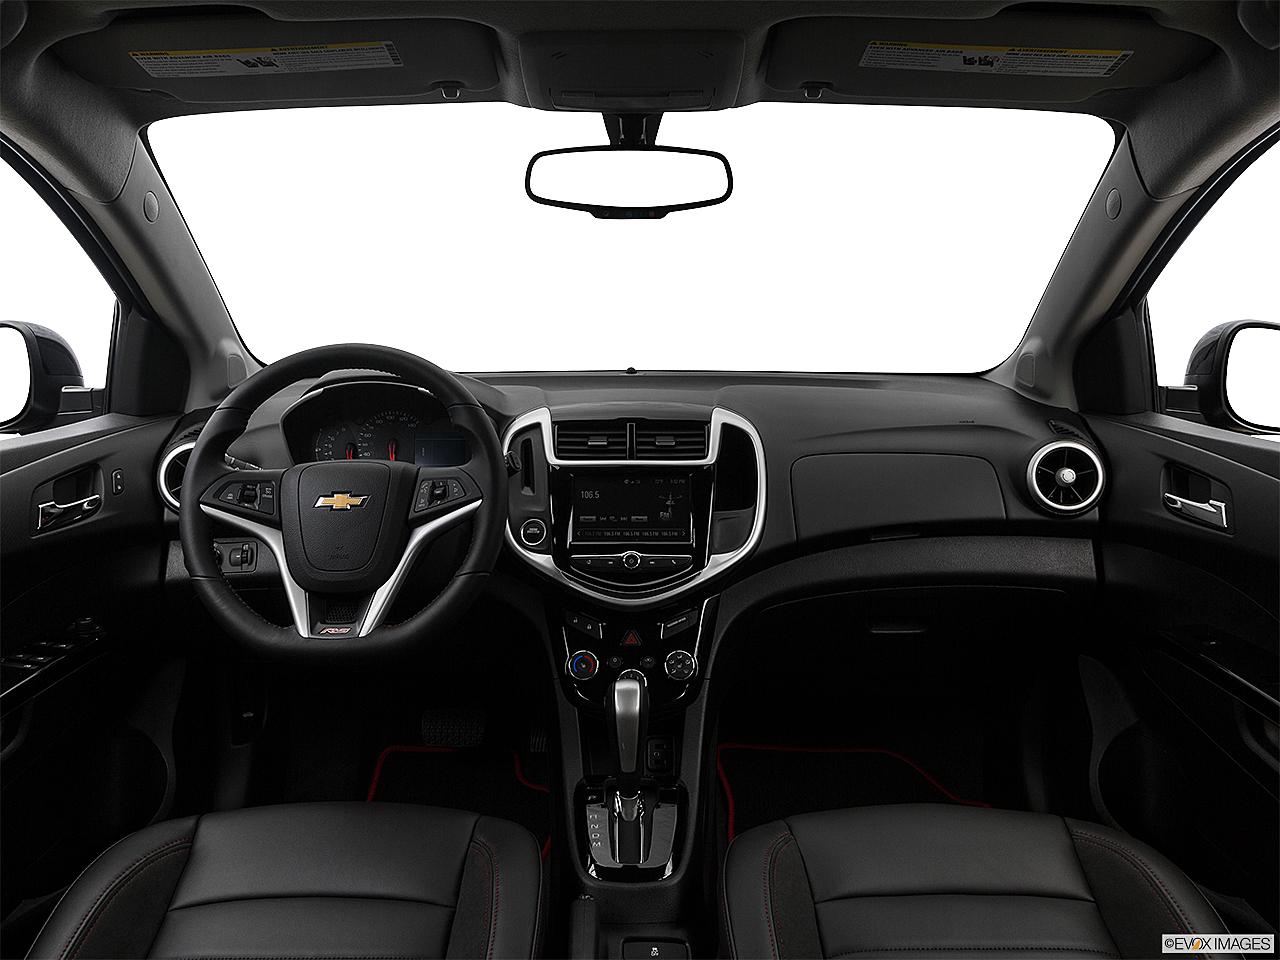 2018 Chevrolet Sonic Premier Auto 5-Door, centered wide dash shot